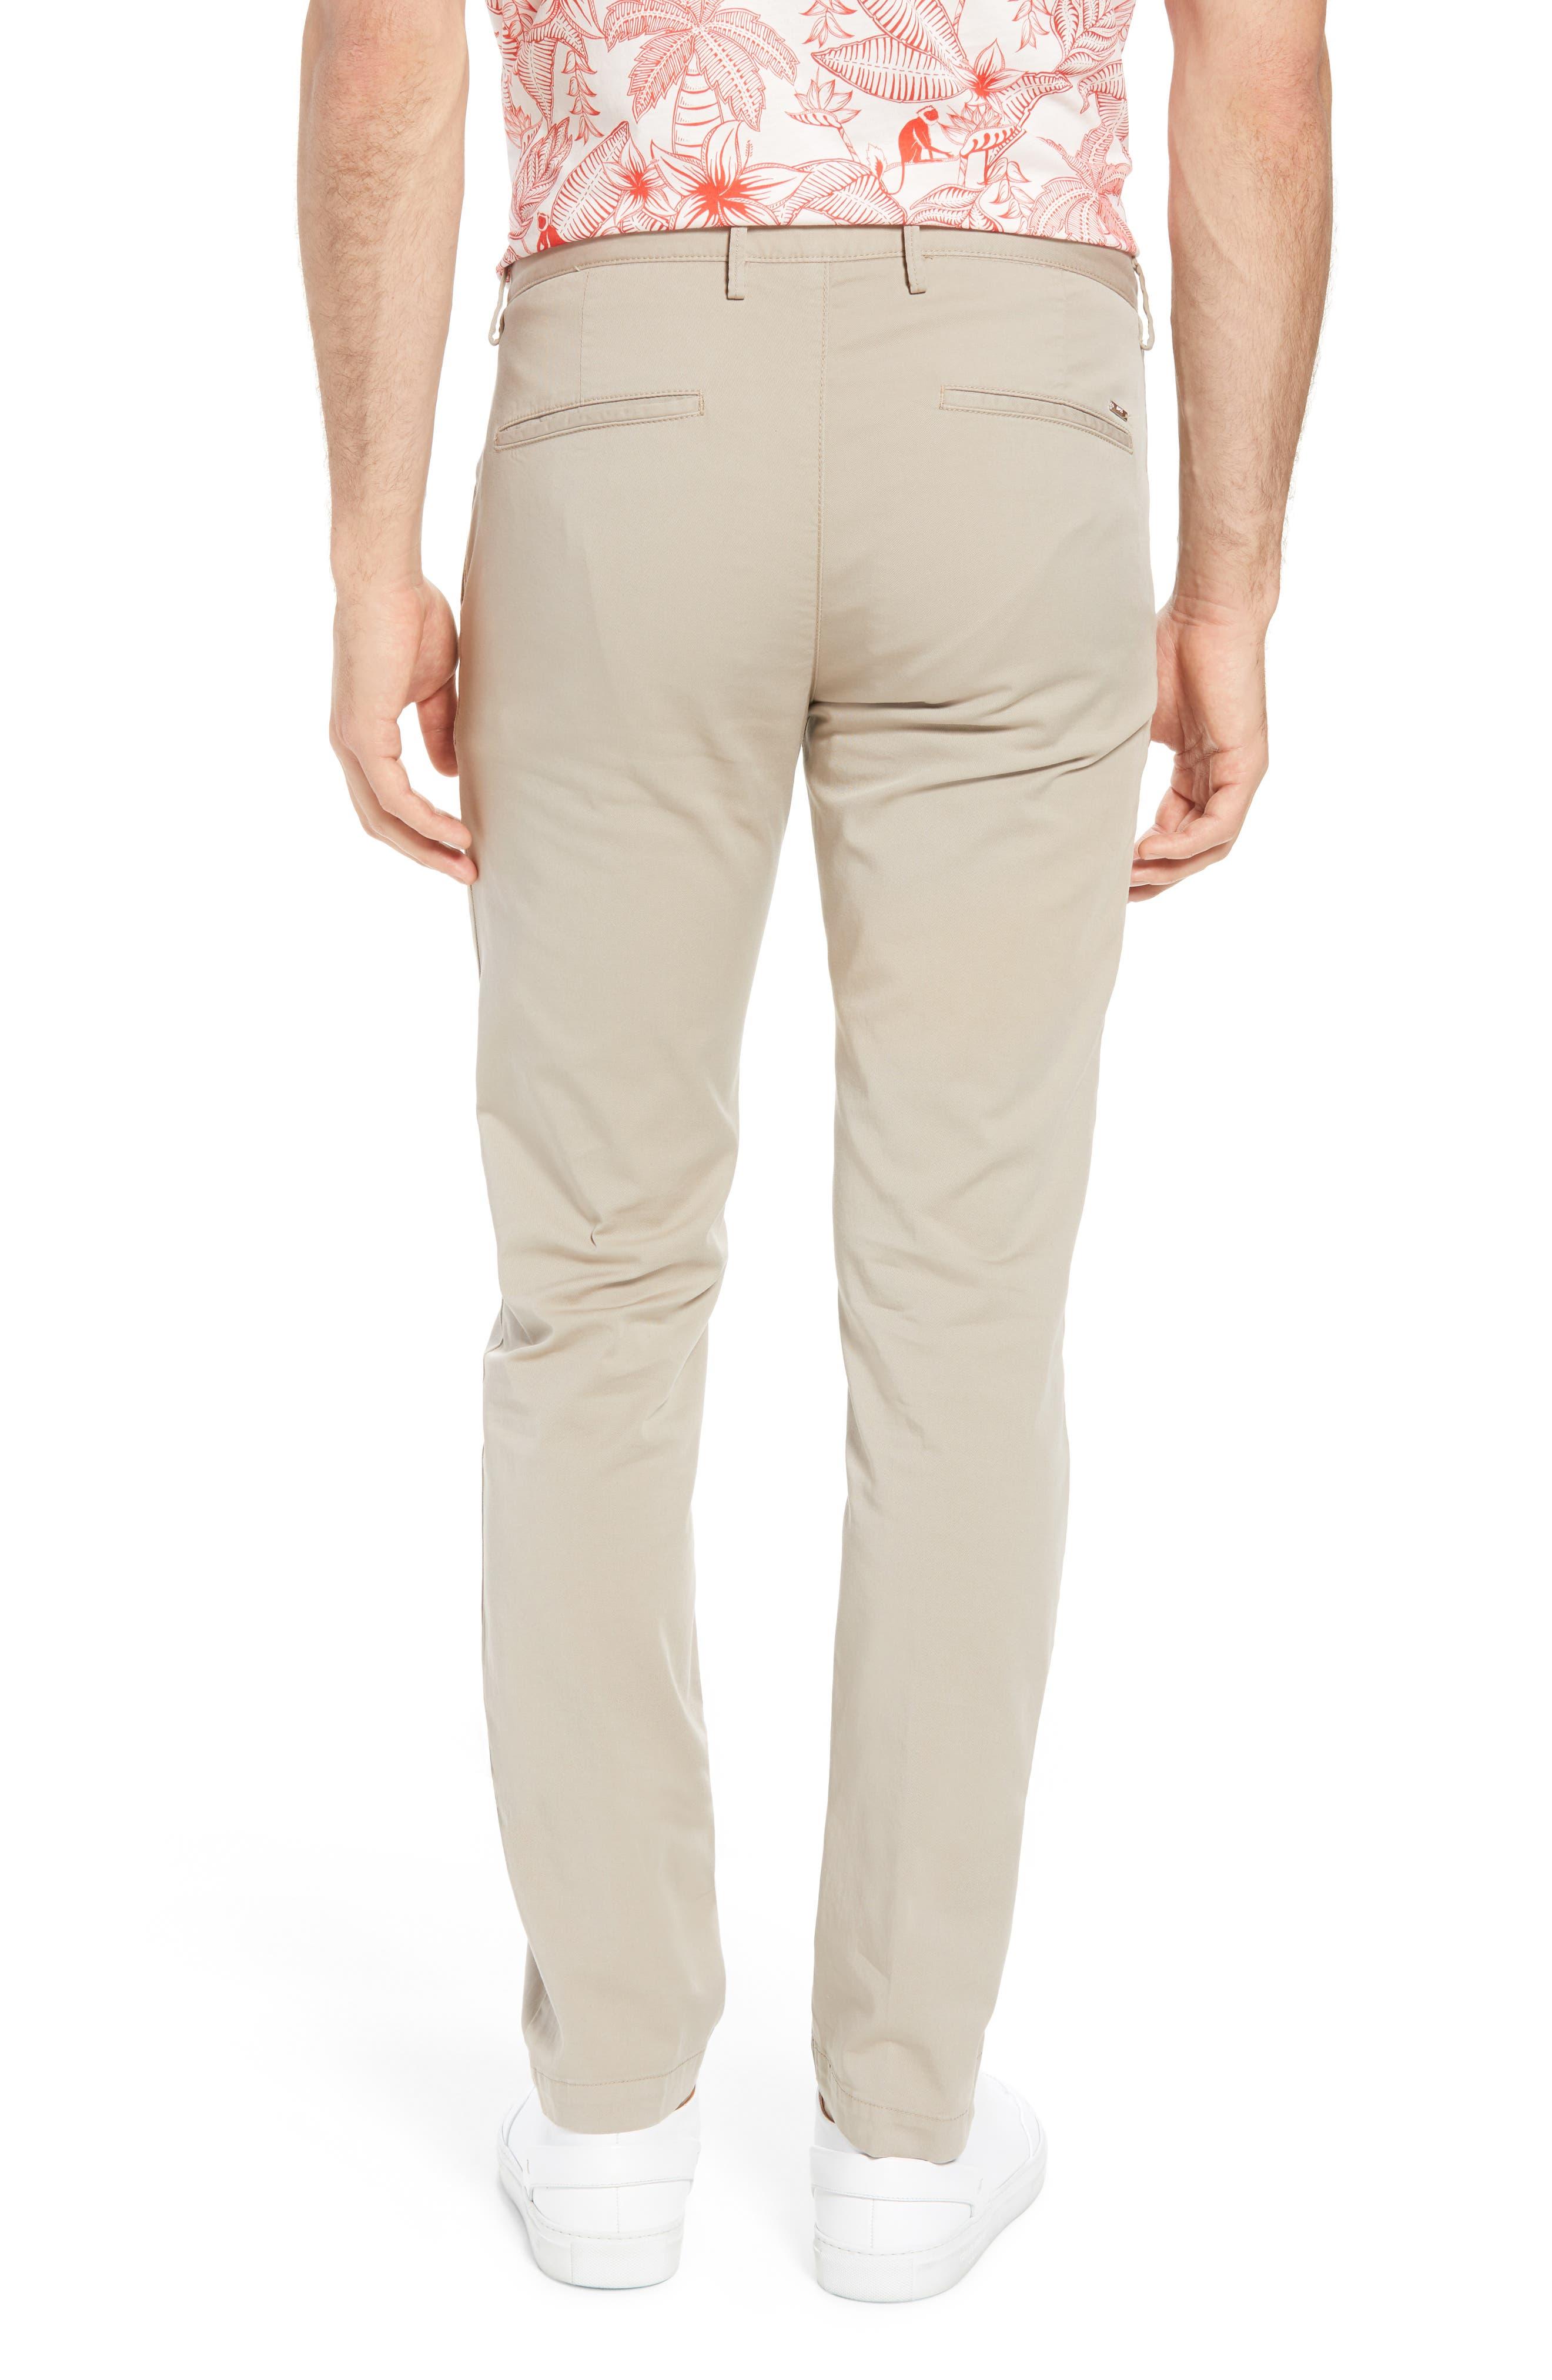 Rice Slim Fit Chino Pants,                             Alternate thumbnail 2, color,                             200